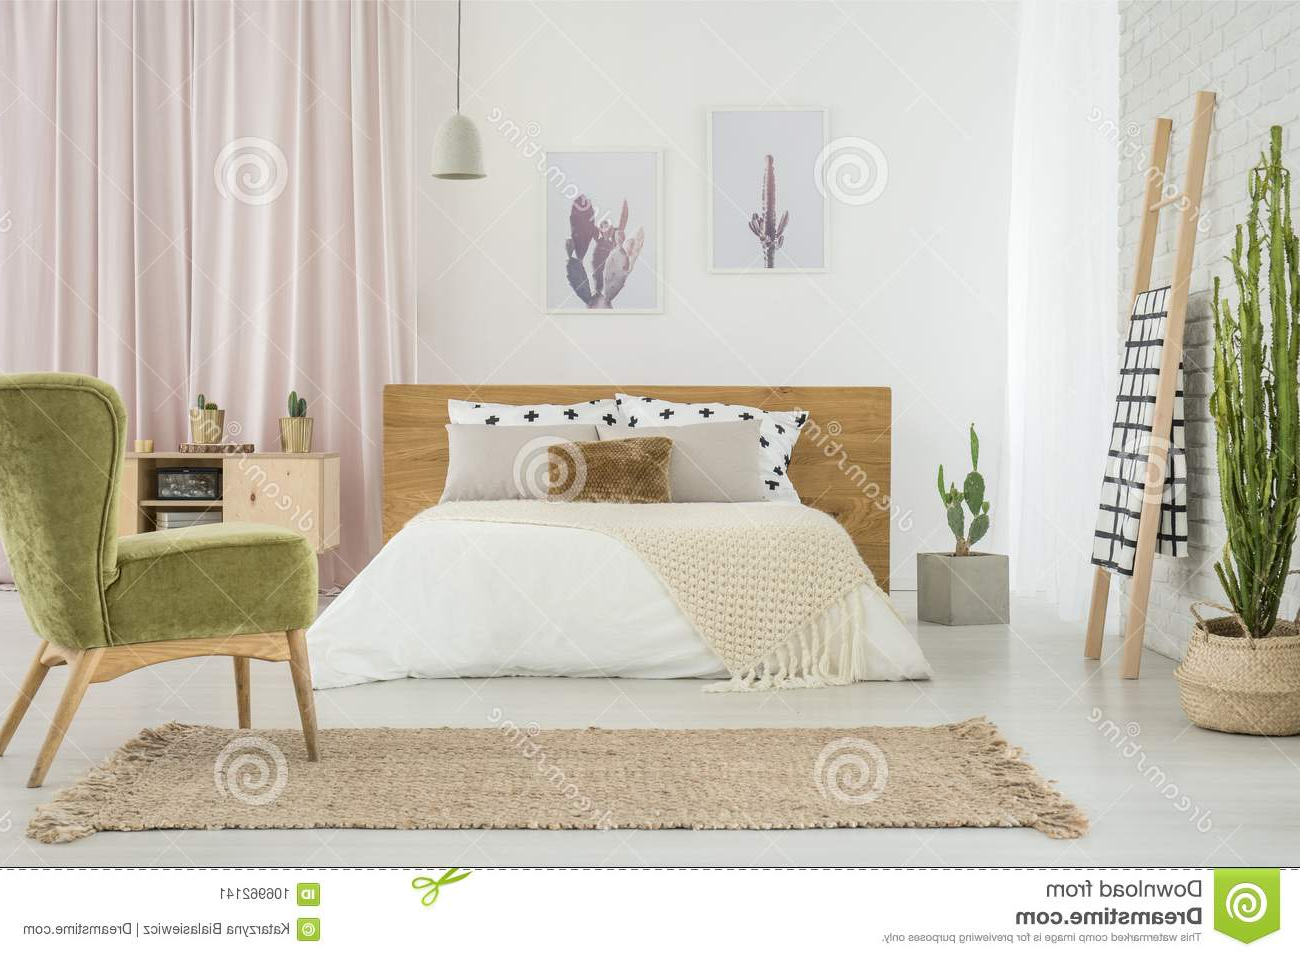 Butaca Dormitorio H9d9 butaca Verde En Dormitorio Acogedor Imagen De Archivo Imagen De